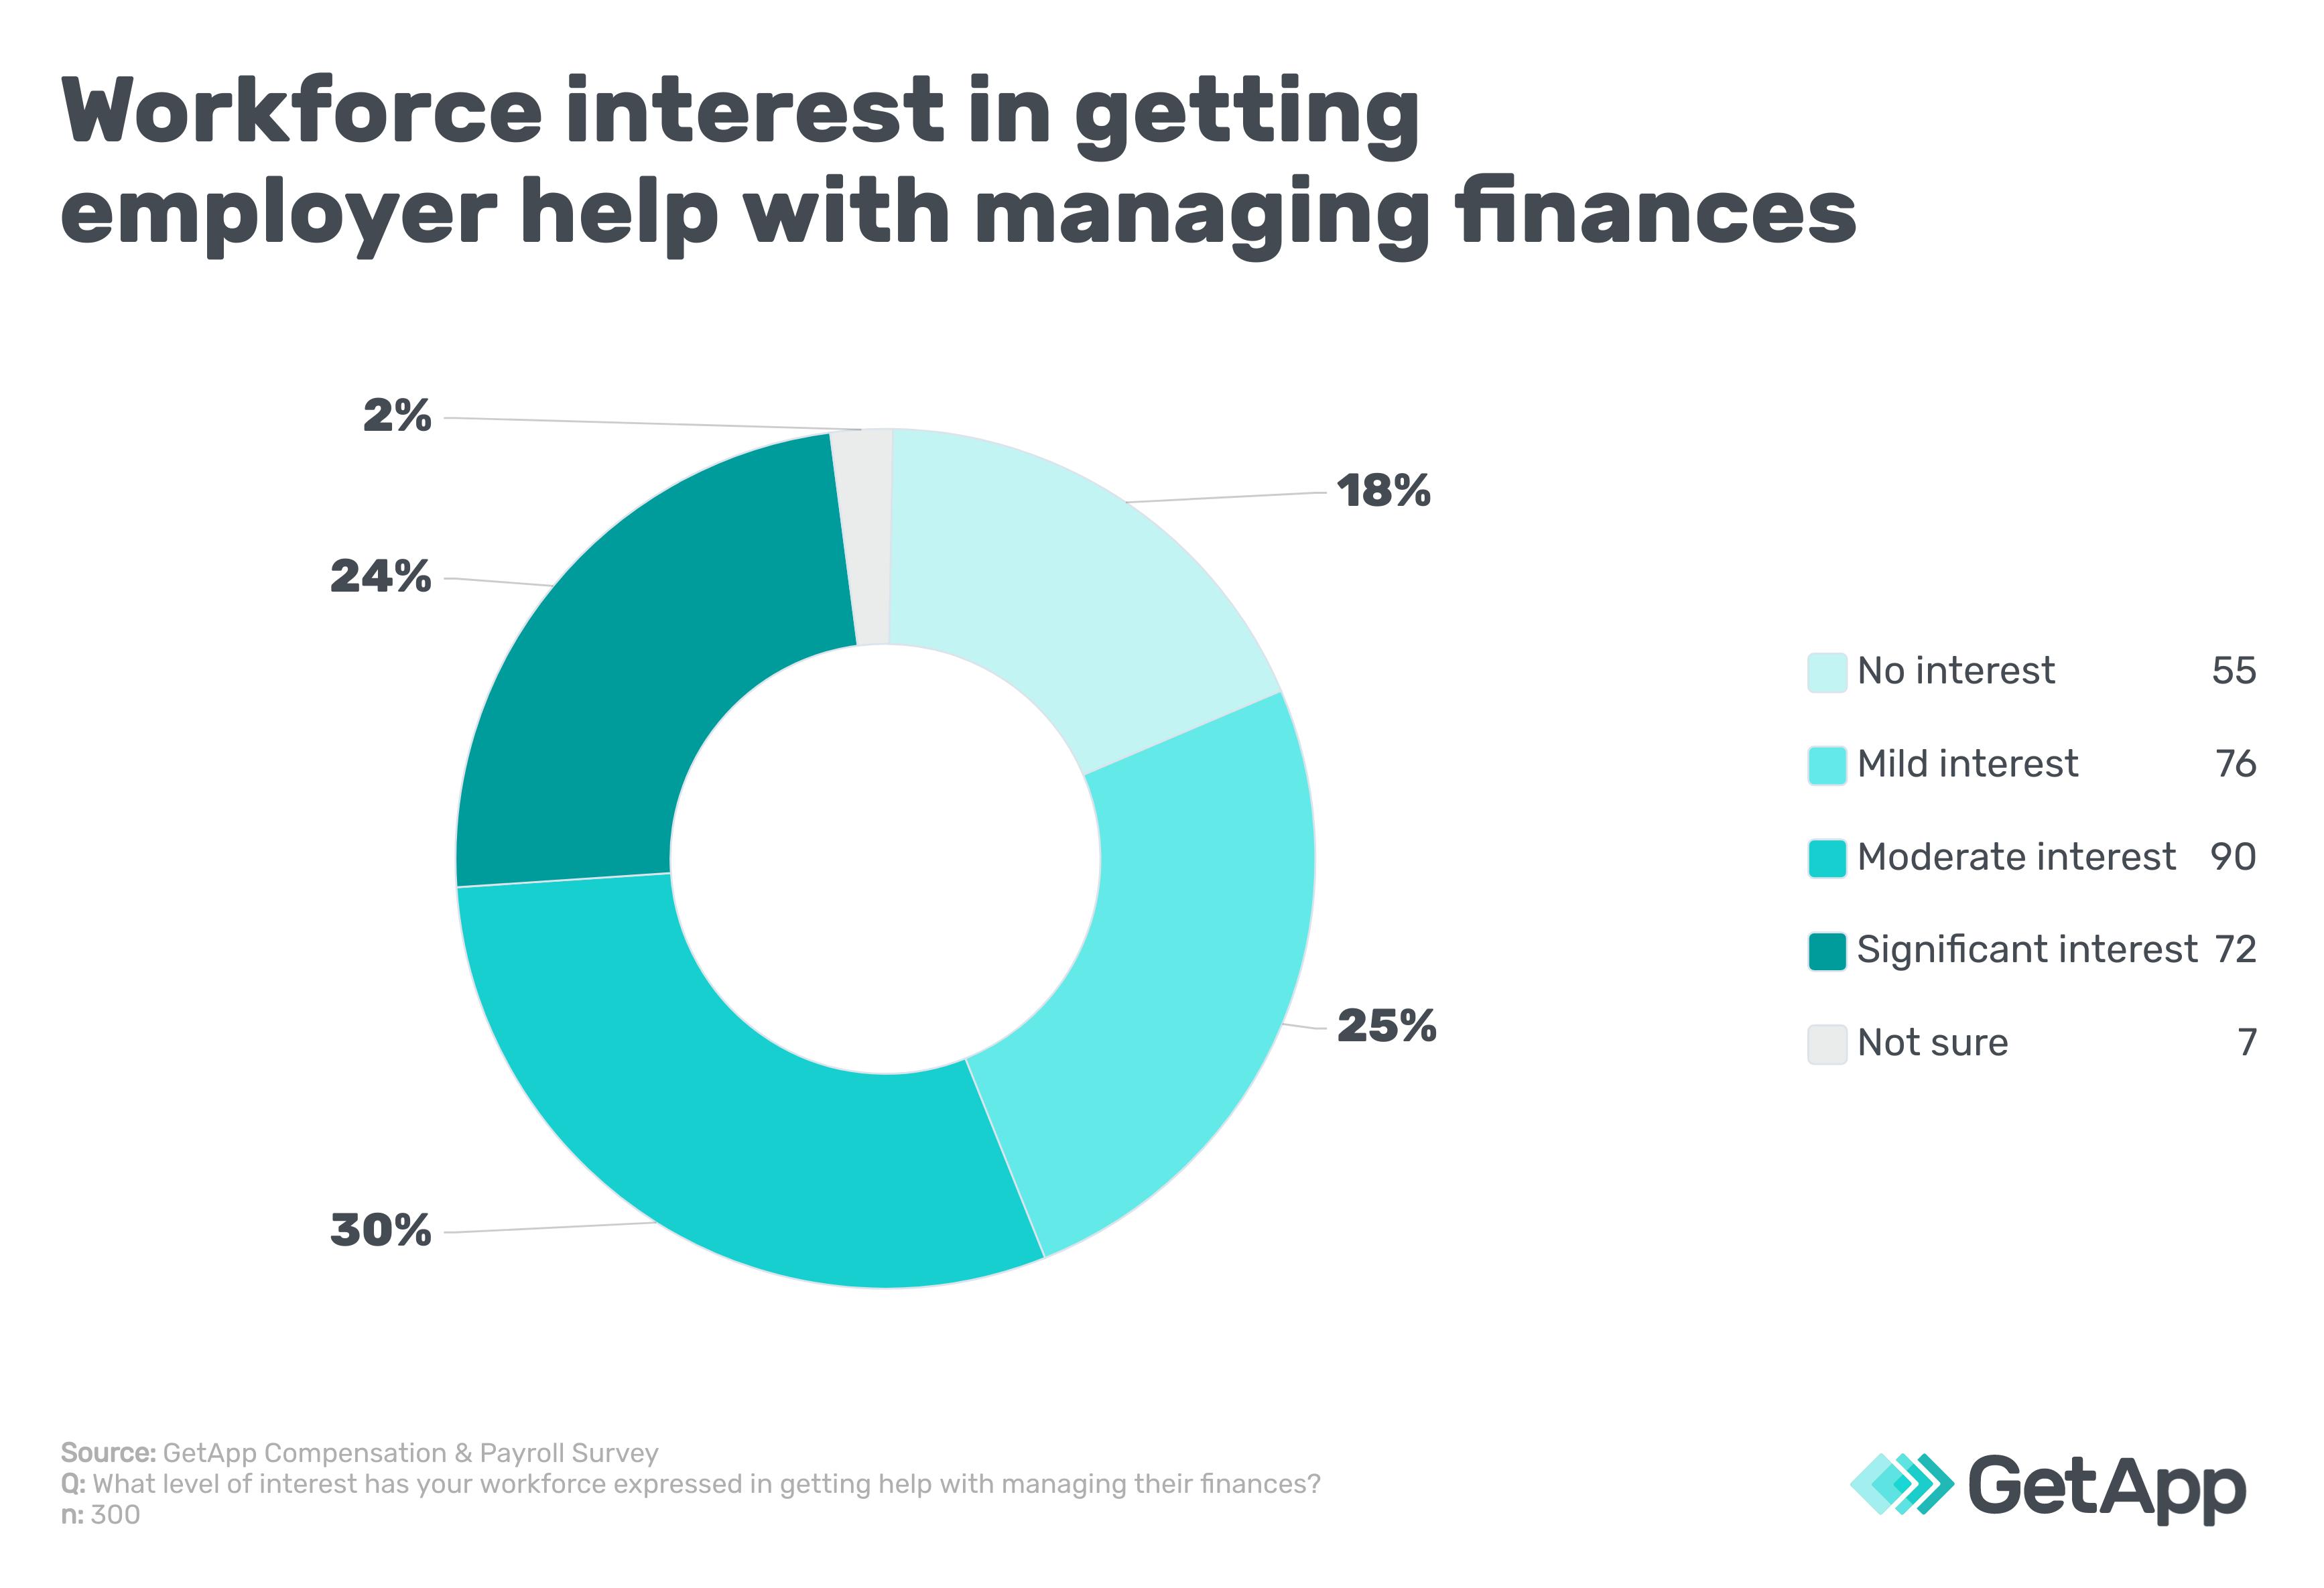 Workforce interest in getting employer help with managing finances